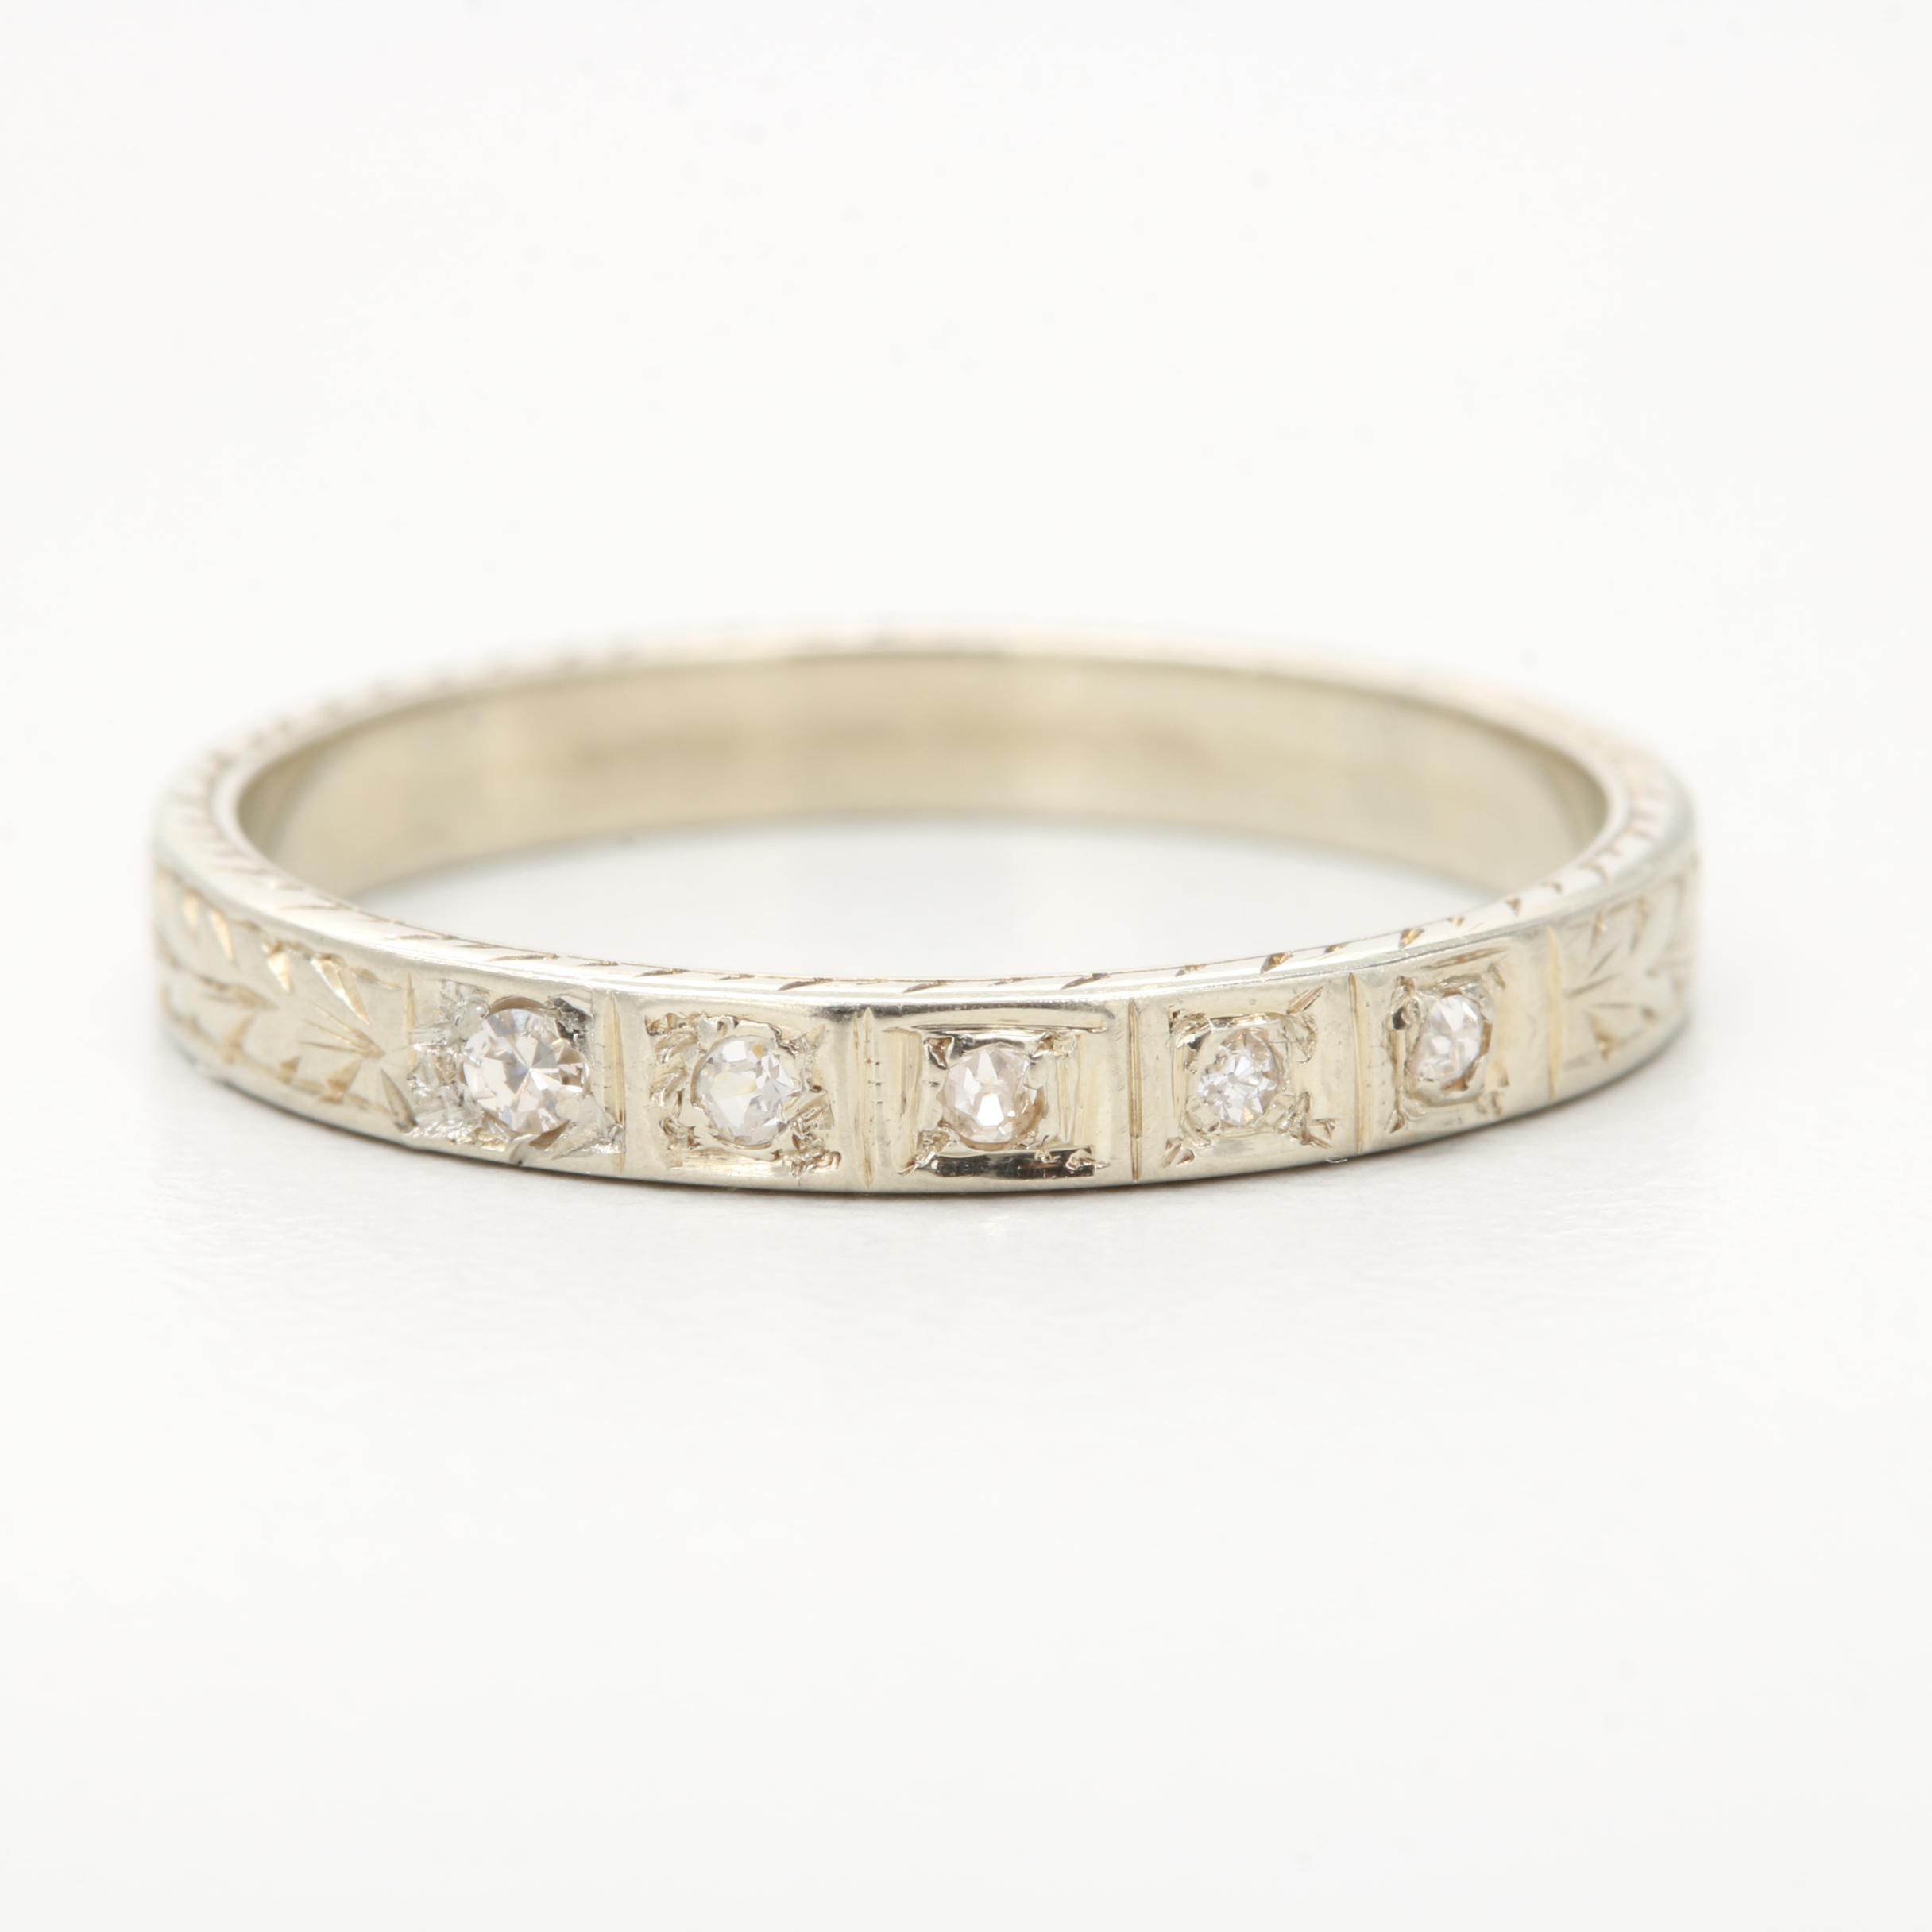 Art Deco 18K White Gold Diamond Ring Including White Sapphire